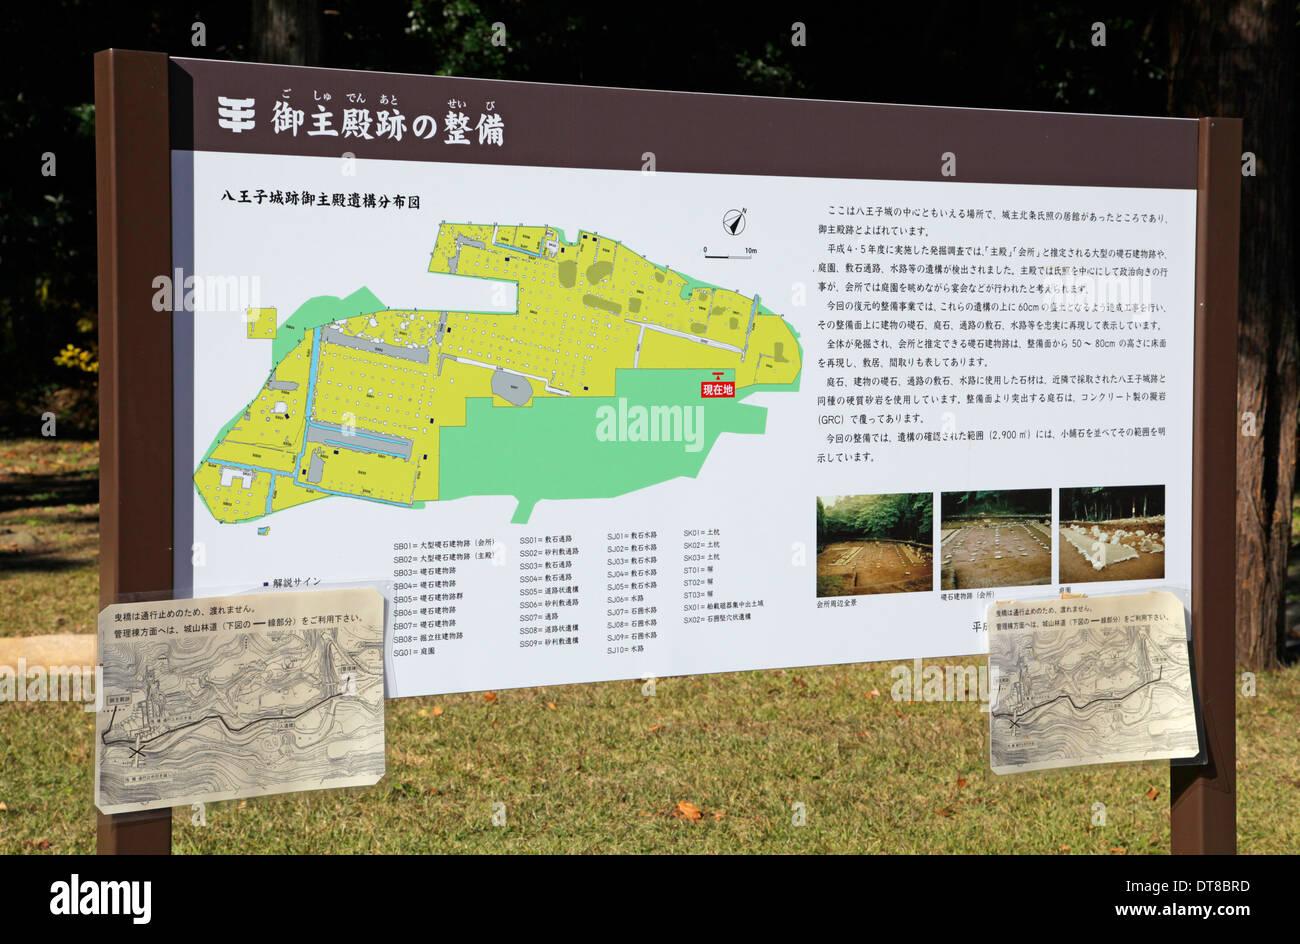 Hachioji Castle main area information map Tokyo Japan Stock Photo